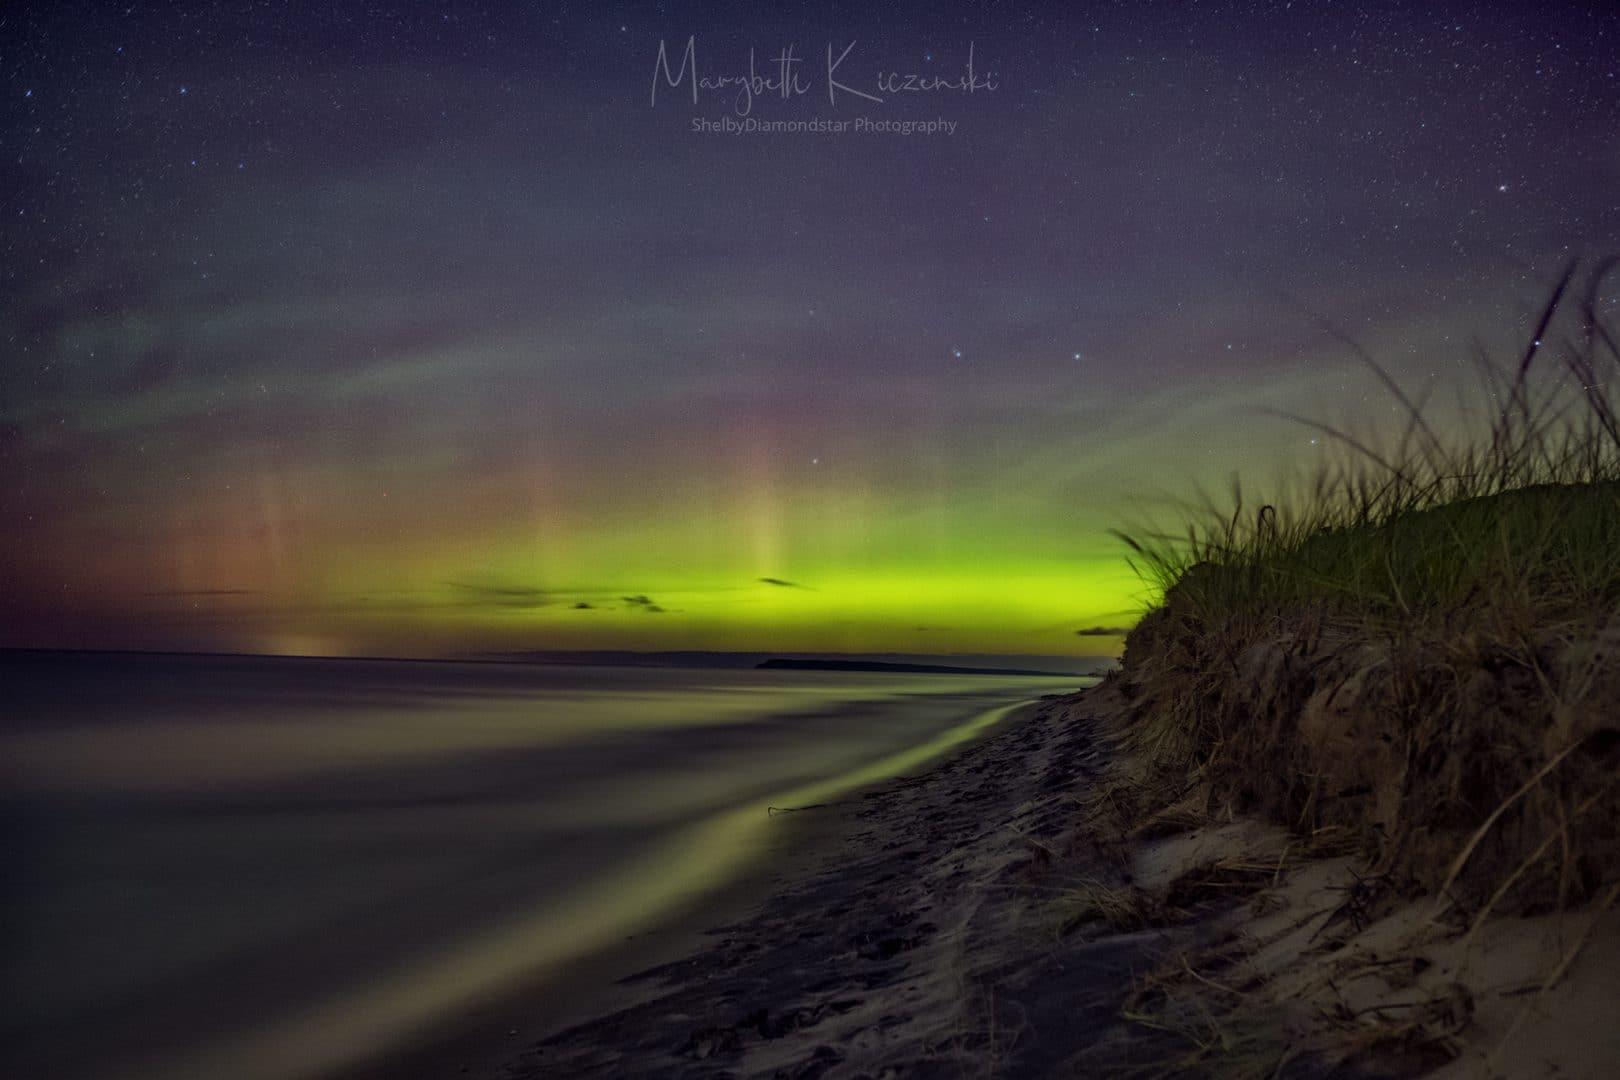 2019 Labor Day Aurora - Aurora and Airglow over the shores of Lake Michigan in Sleeping Bear Dunes National Lakeshore, Empire, MI. Photo by MaryBeth Kiczenski.